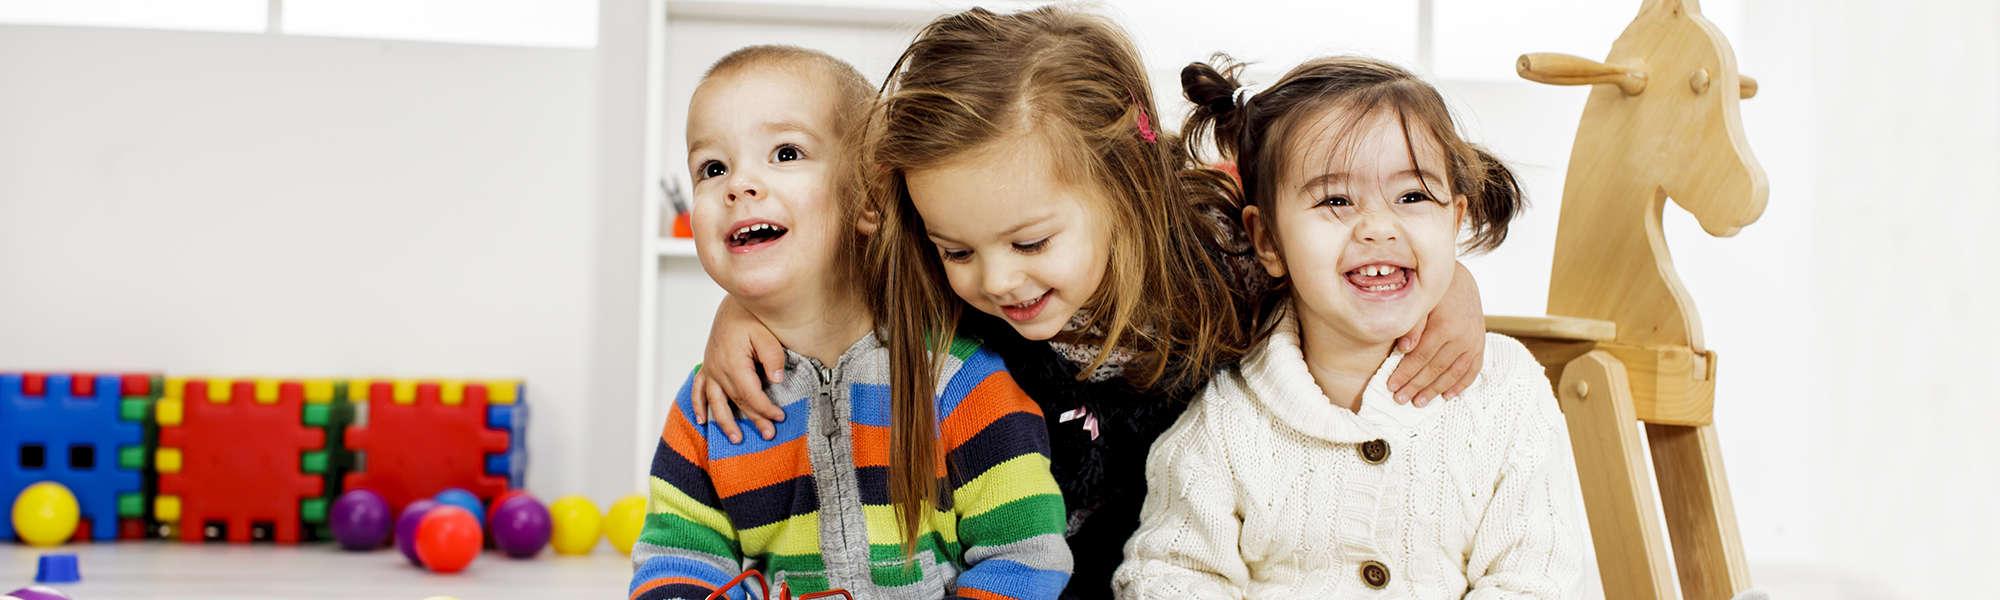 Encouraging Social Development in Your Little One